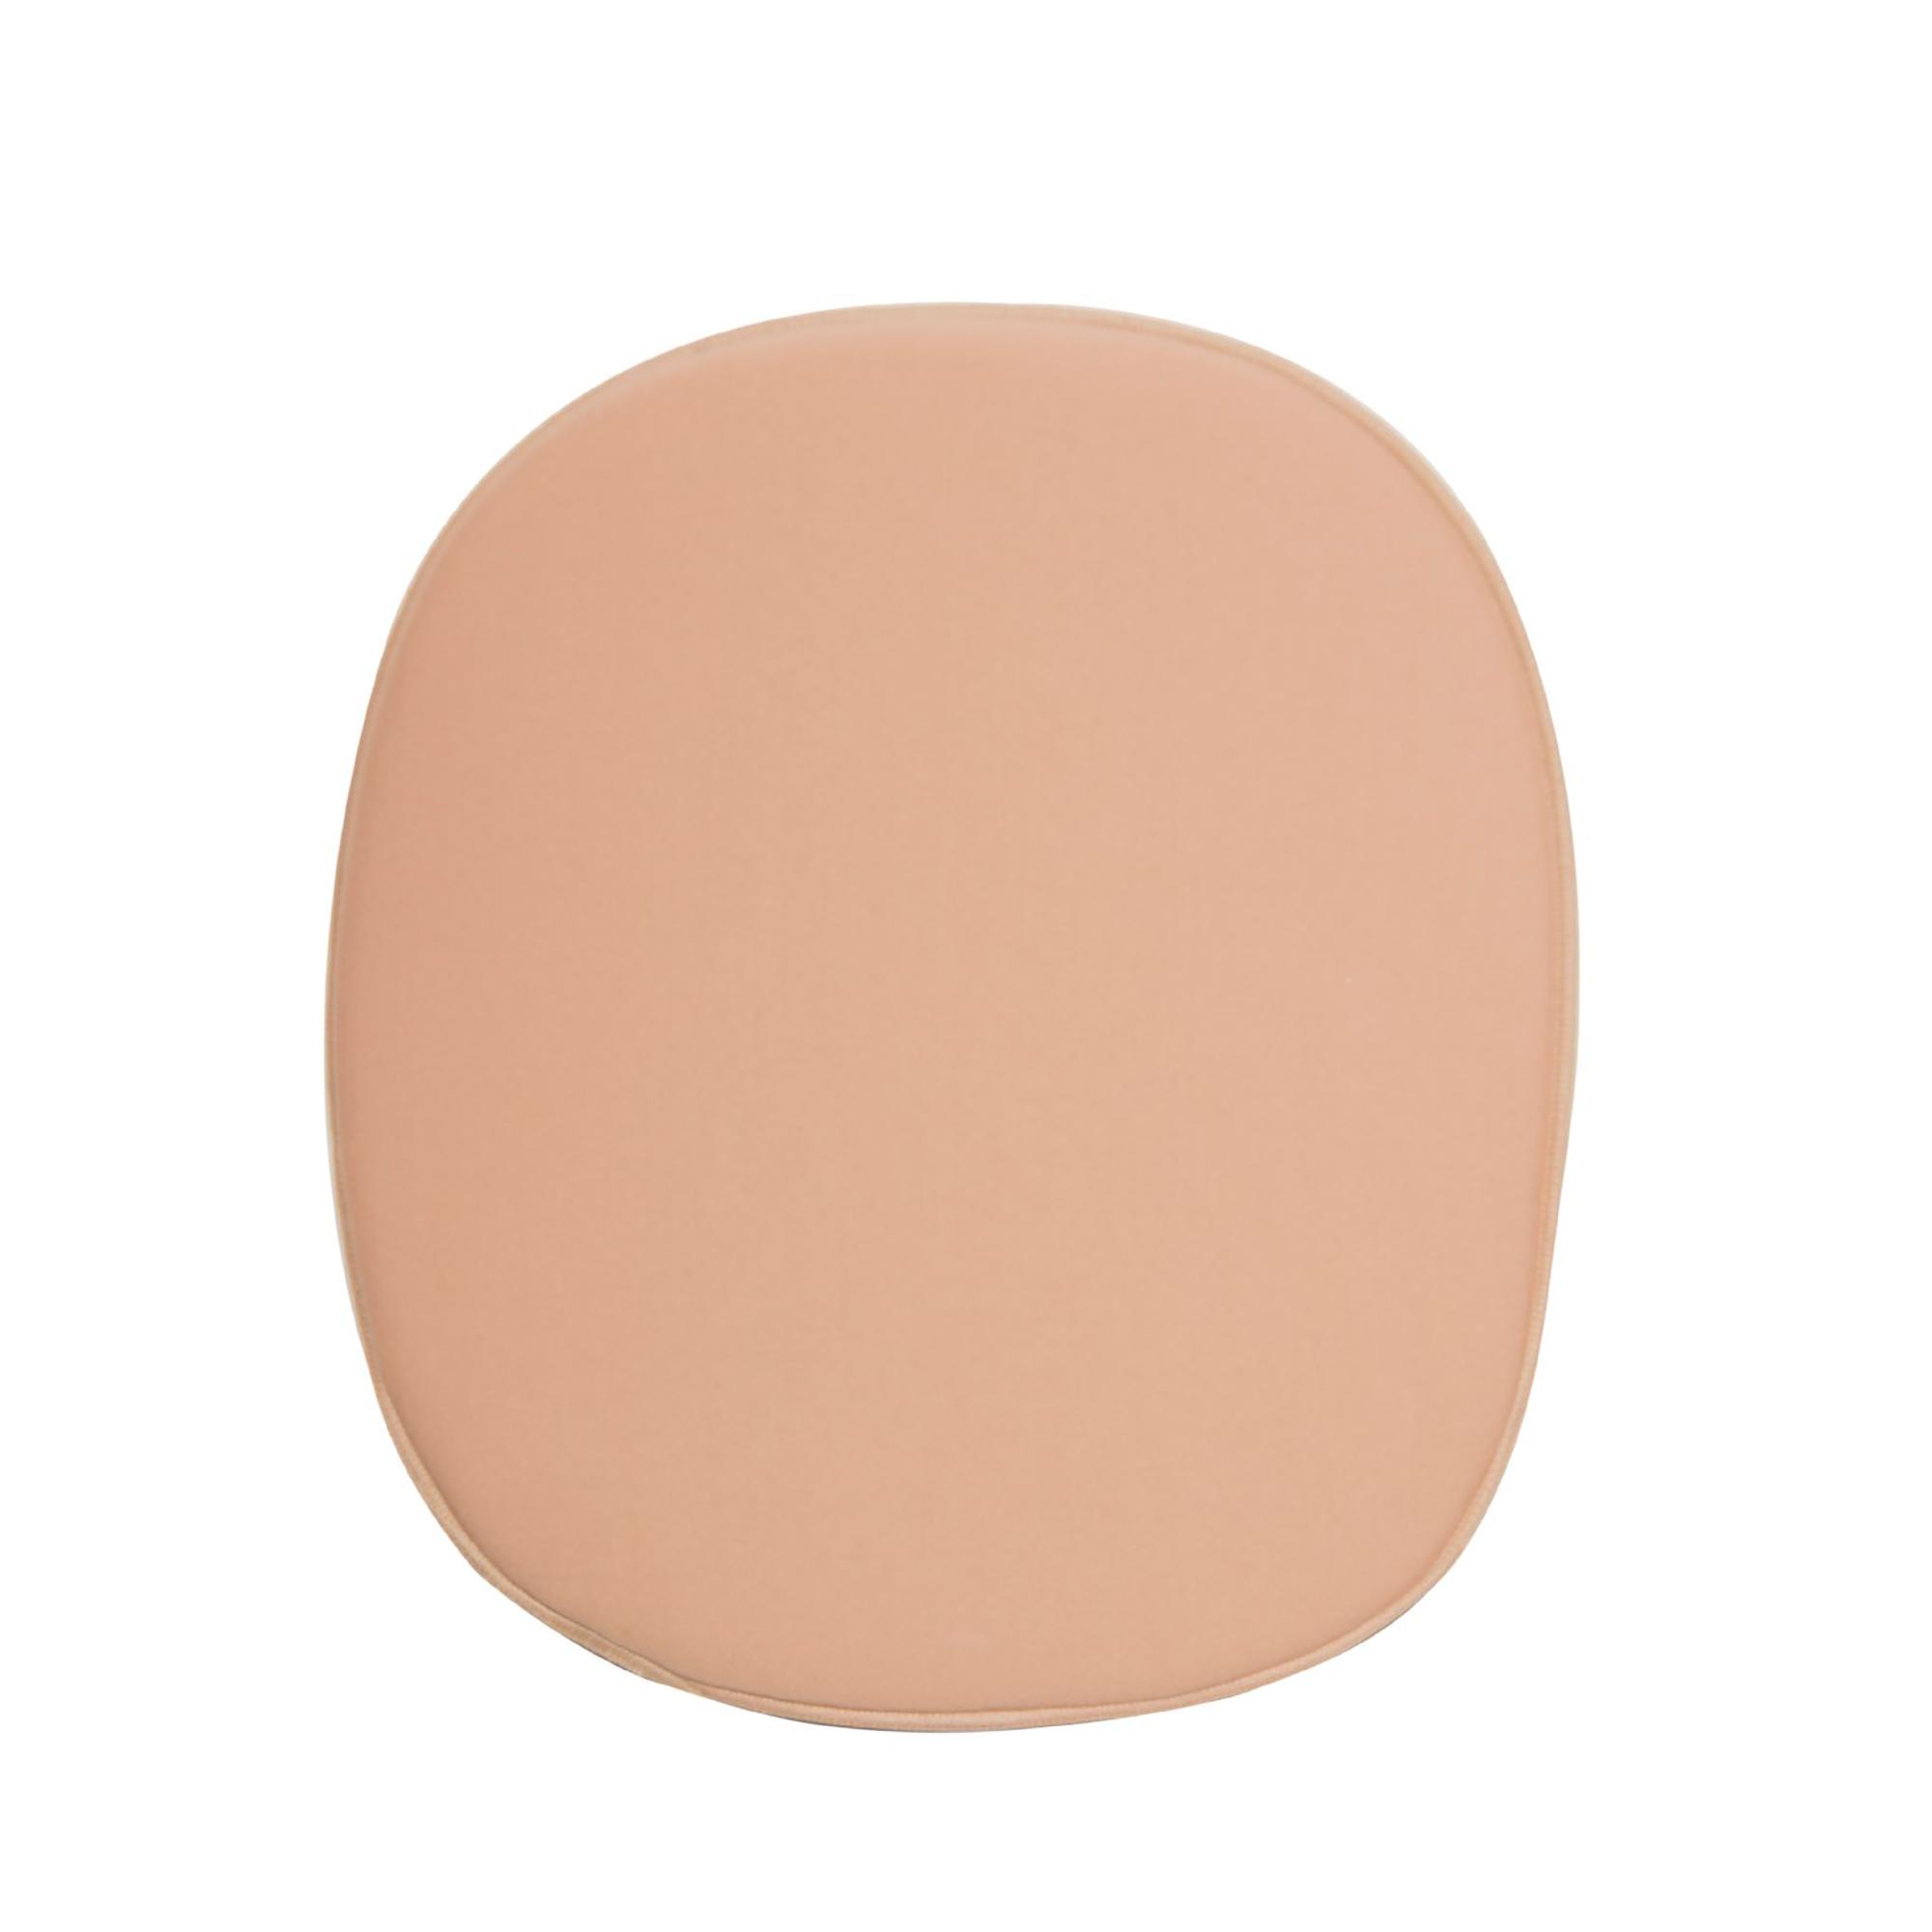 Placa tala rígida pós cirúrgica compressiva oval New Form 90011A para abdômen e costas. Ideal para abdominoplastia lipo  - Cinta se Nova